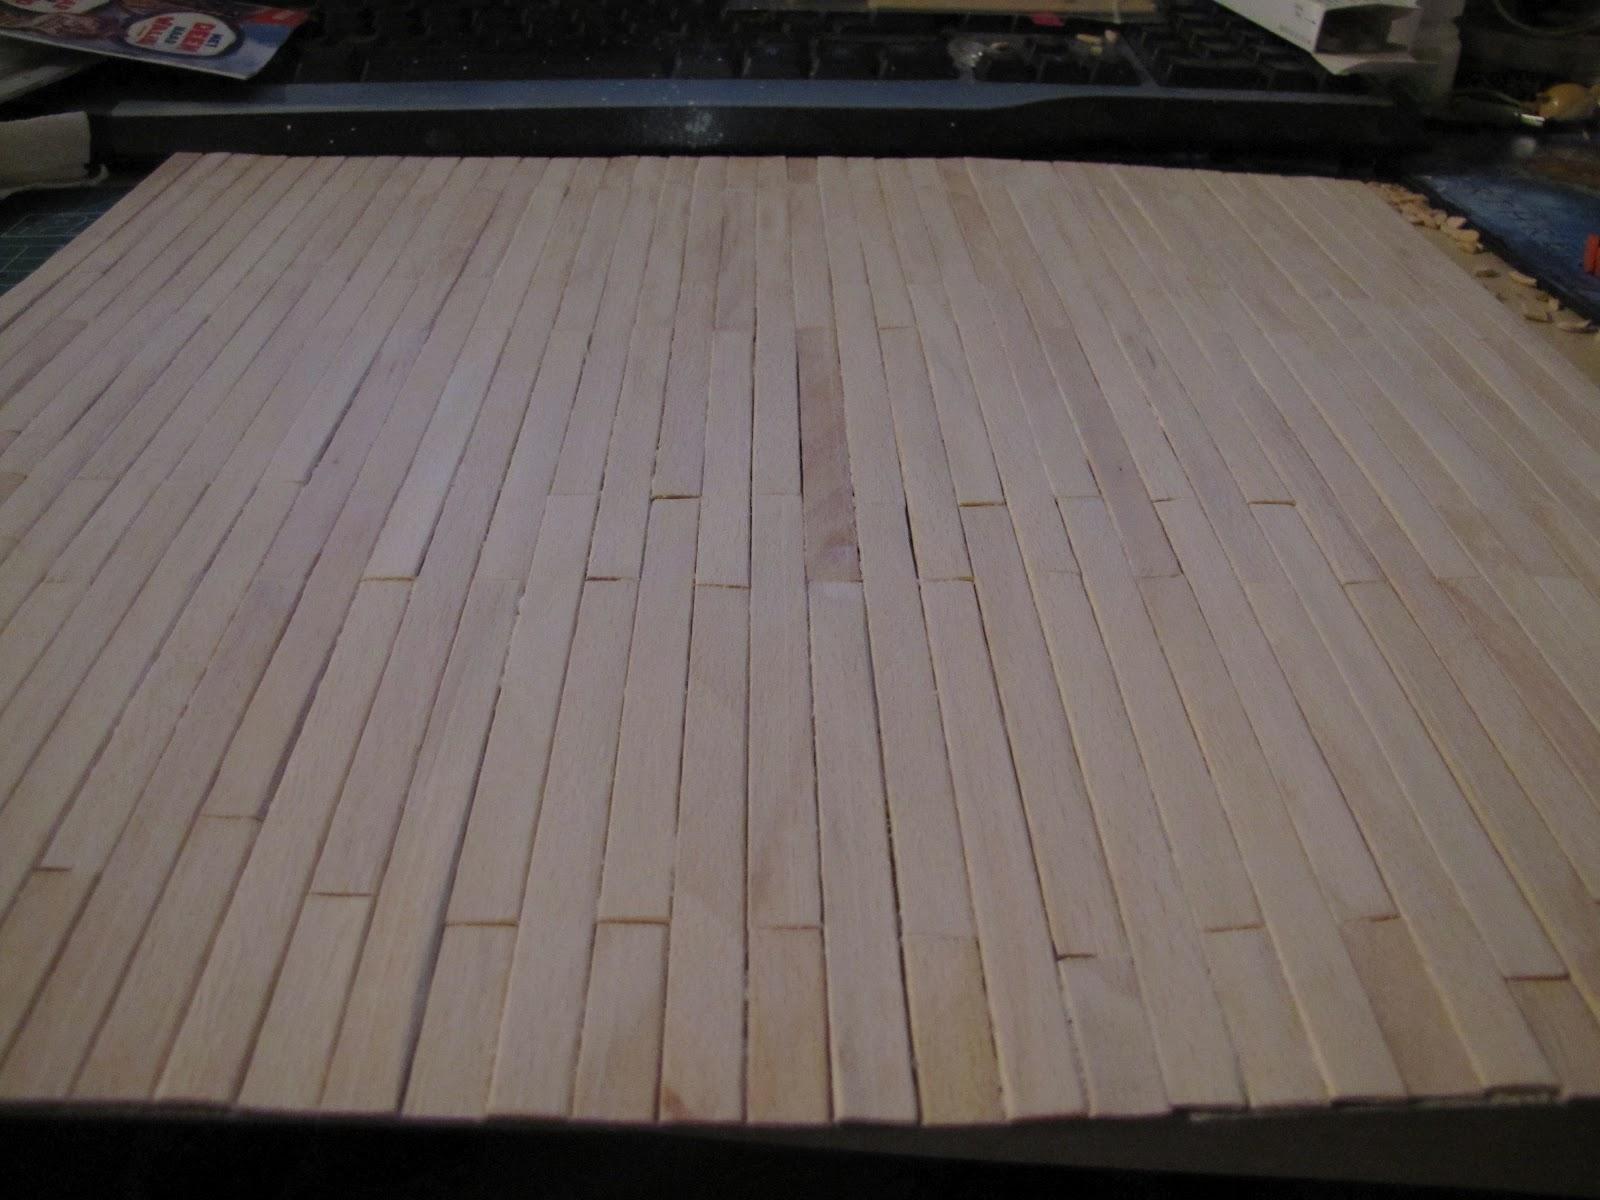 Casa dida houten vloer